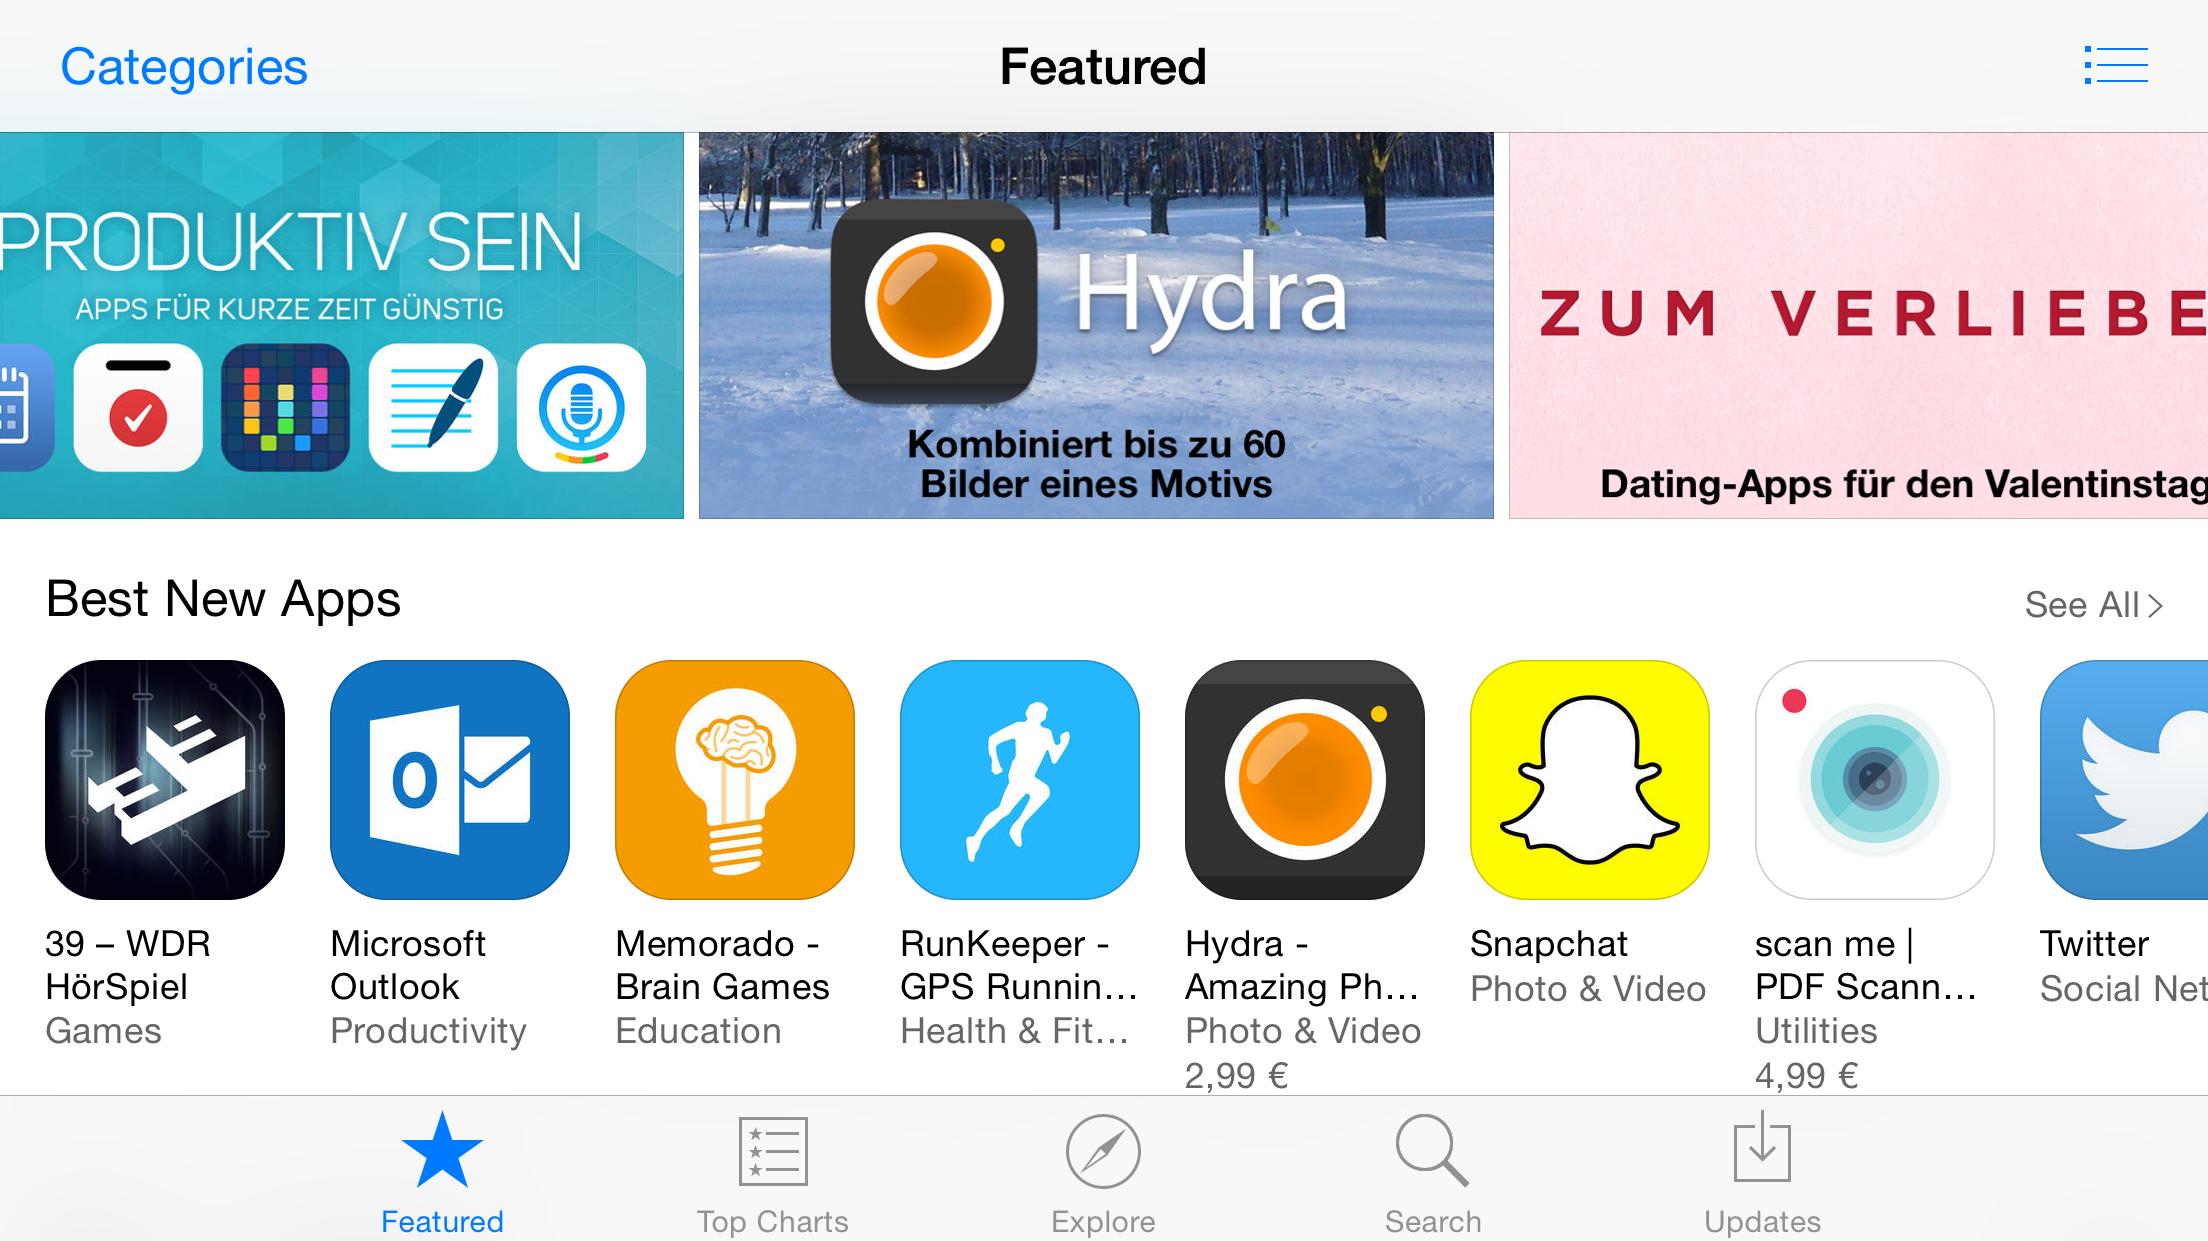 IOS Tipp App Store Frisch Laden